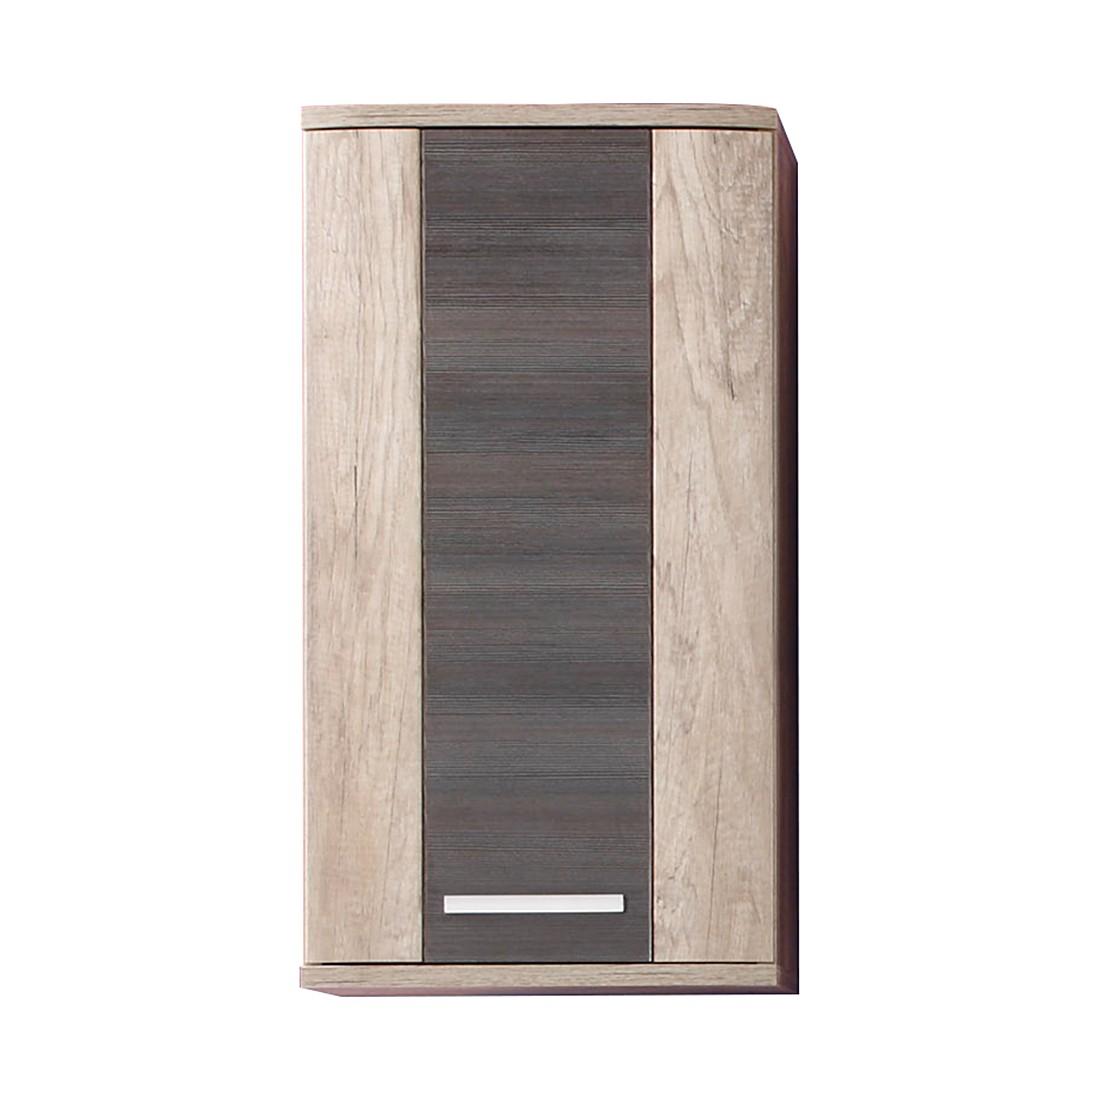 Armoire suspendue Taris - Imitation chêne / Touchwood, Trendteam